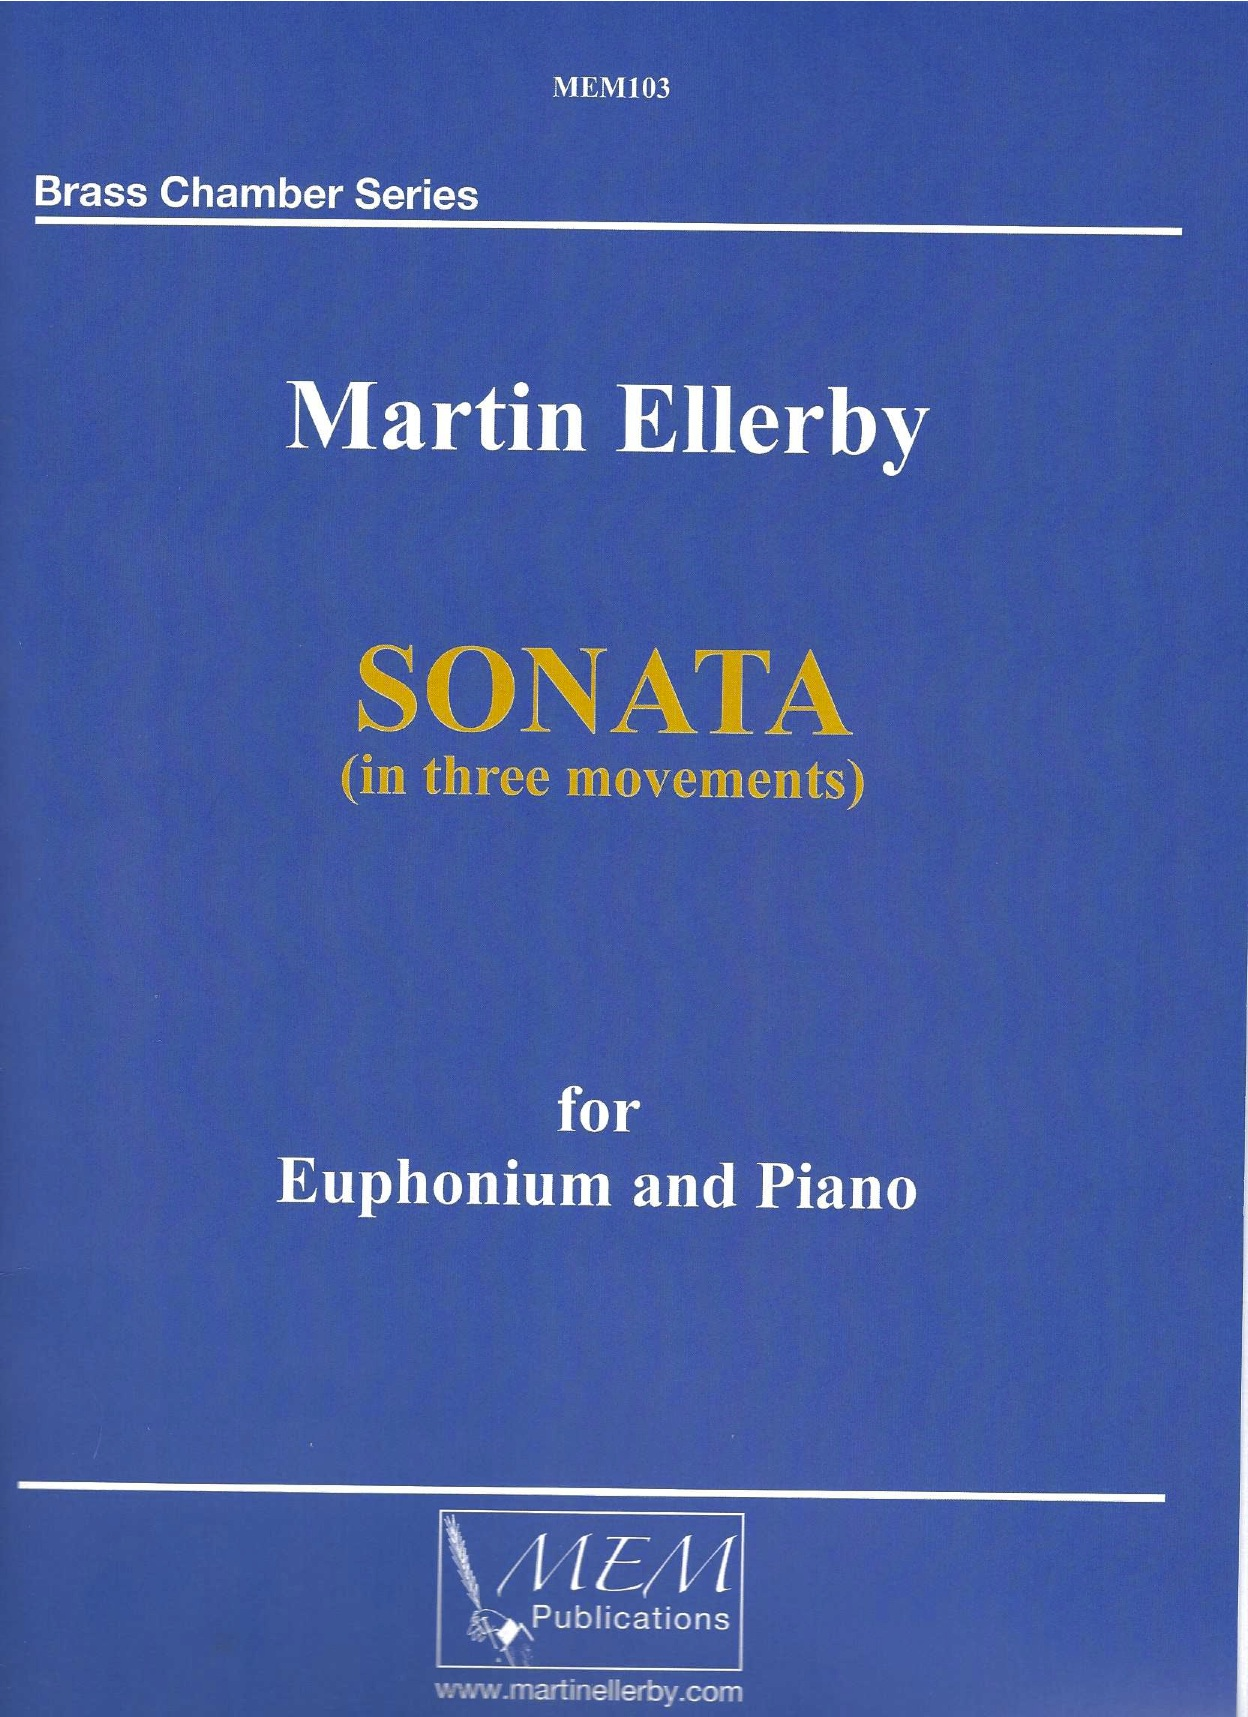 Sonata for Euphonium and Piano - Martin Ellerby